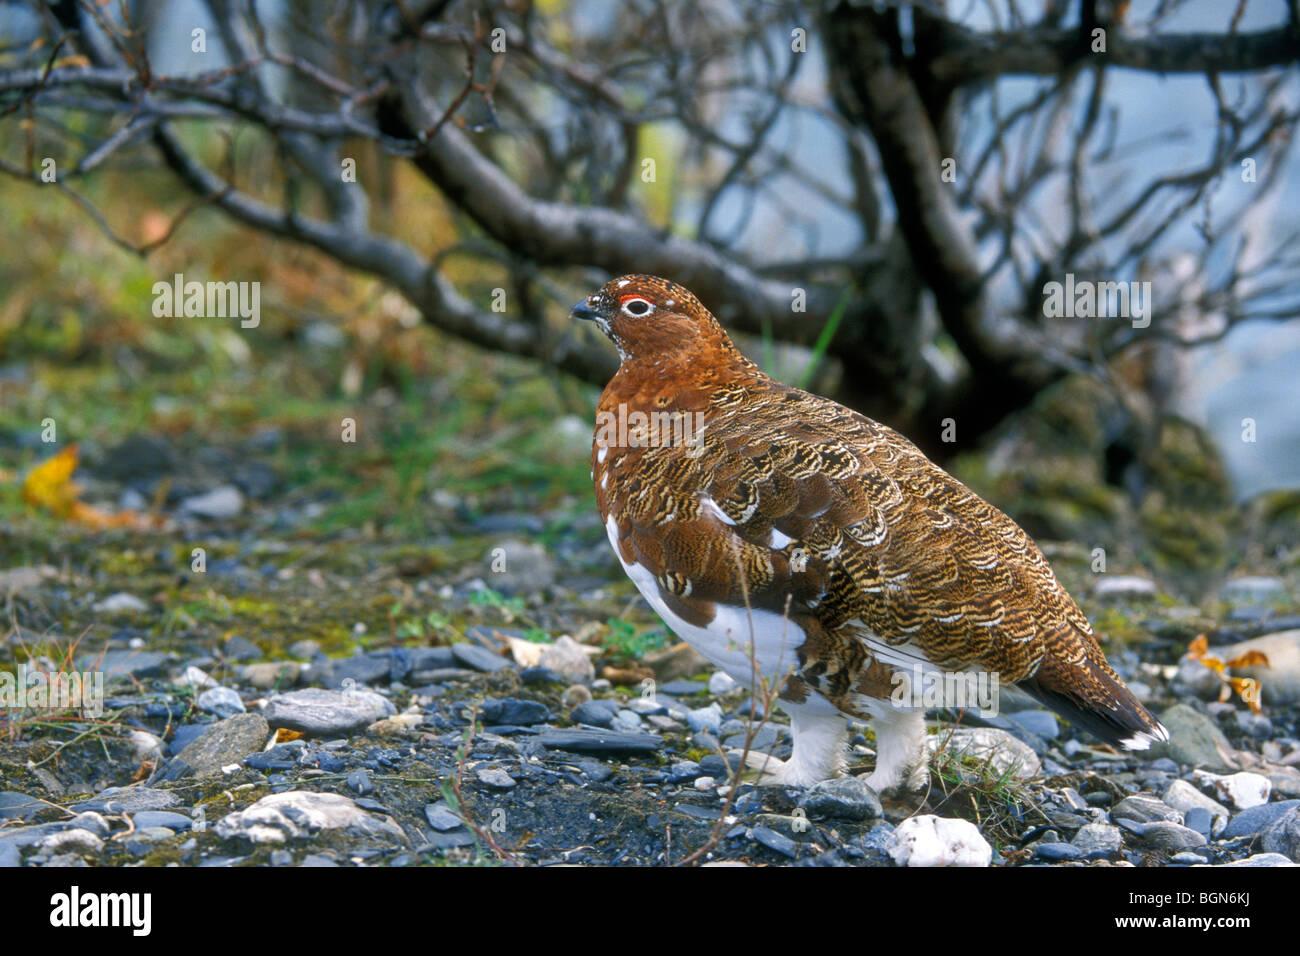 Willow ptarmigan / willow grouse / red grouse (Lagopus lagopus) in autumn plumage on the tundra, Denali NP, Alaska, - Stock Image